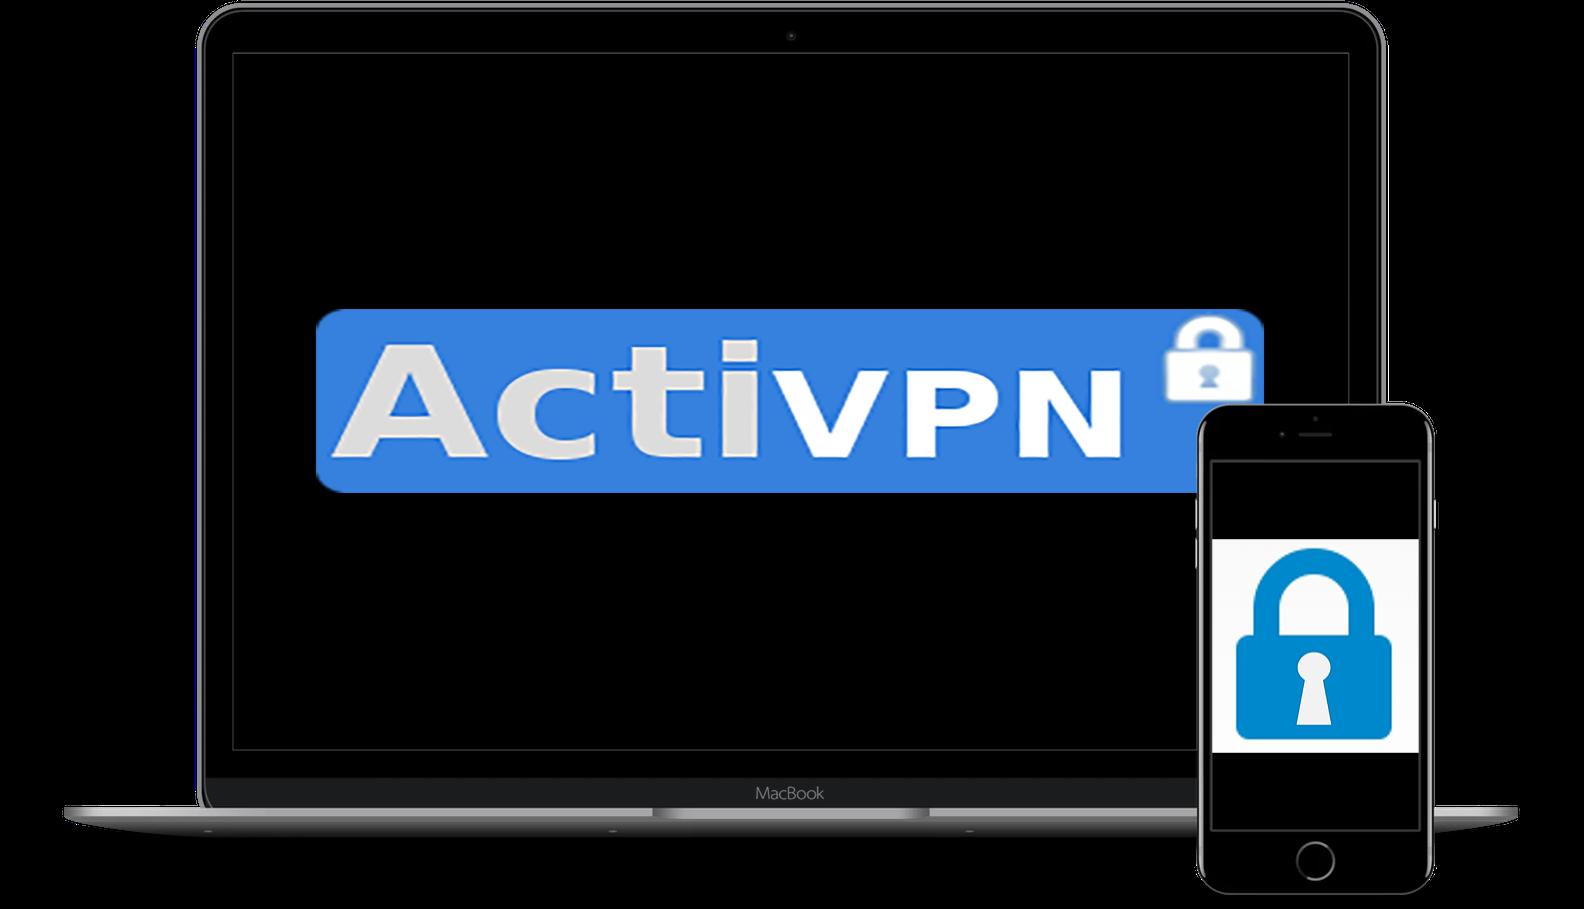 activpn devices